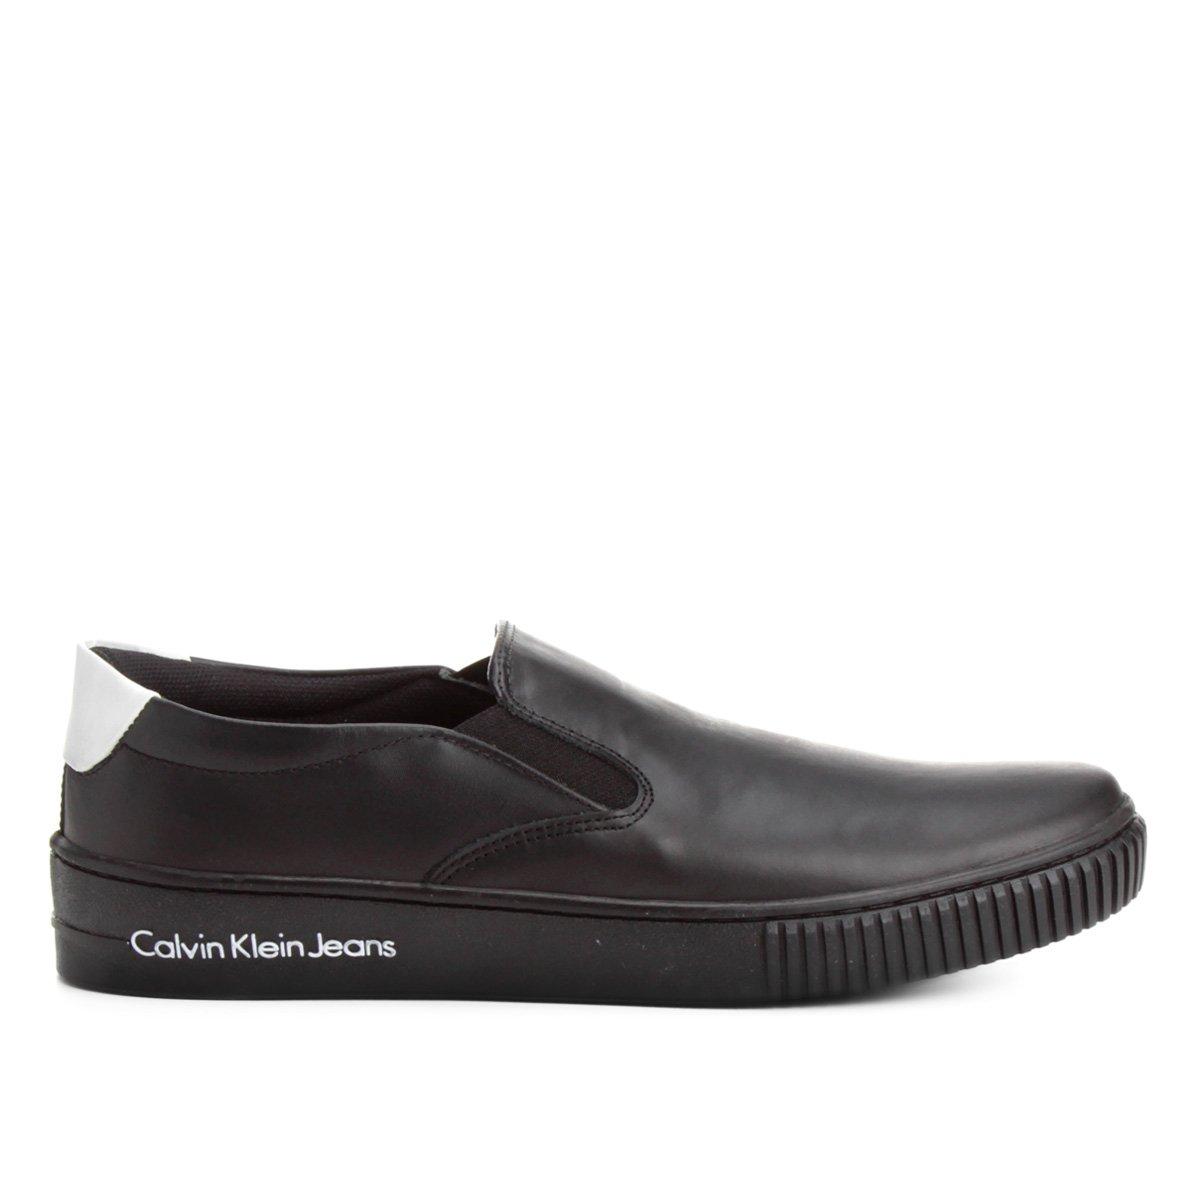 c87da618912e3 Slip On Couro Calvin Klein Iate Masculino - Compre Agora   Netshoes